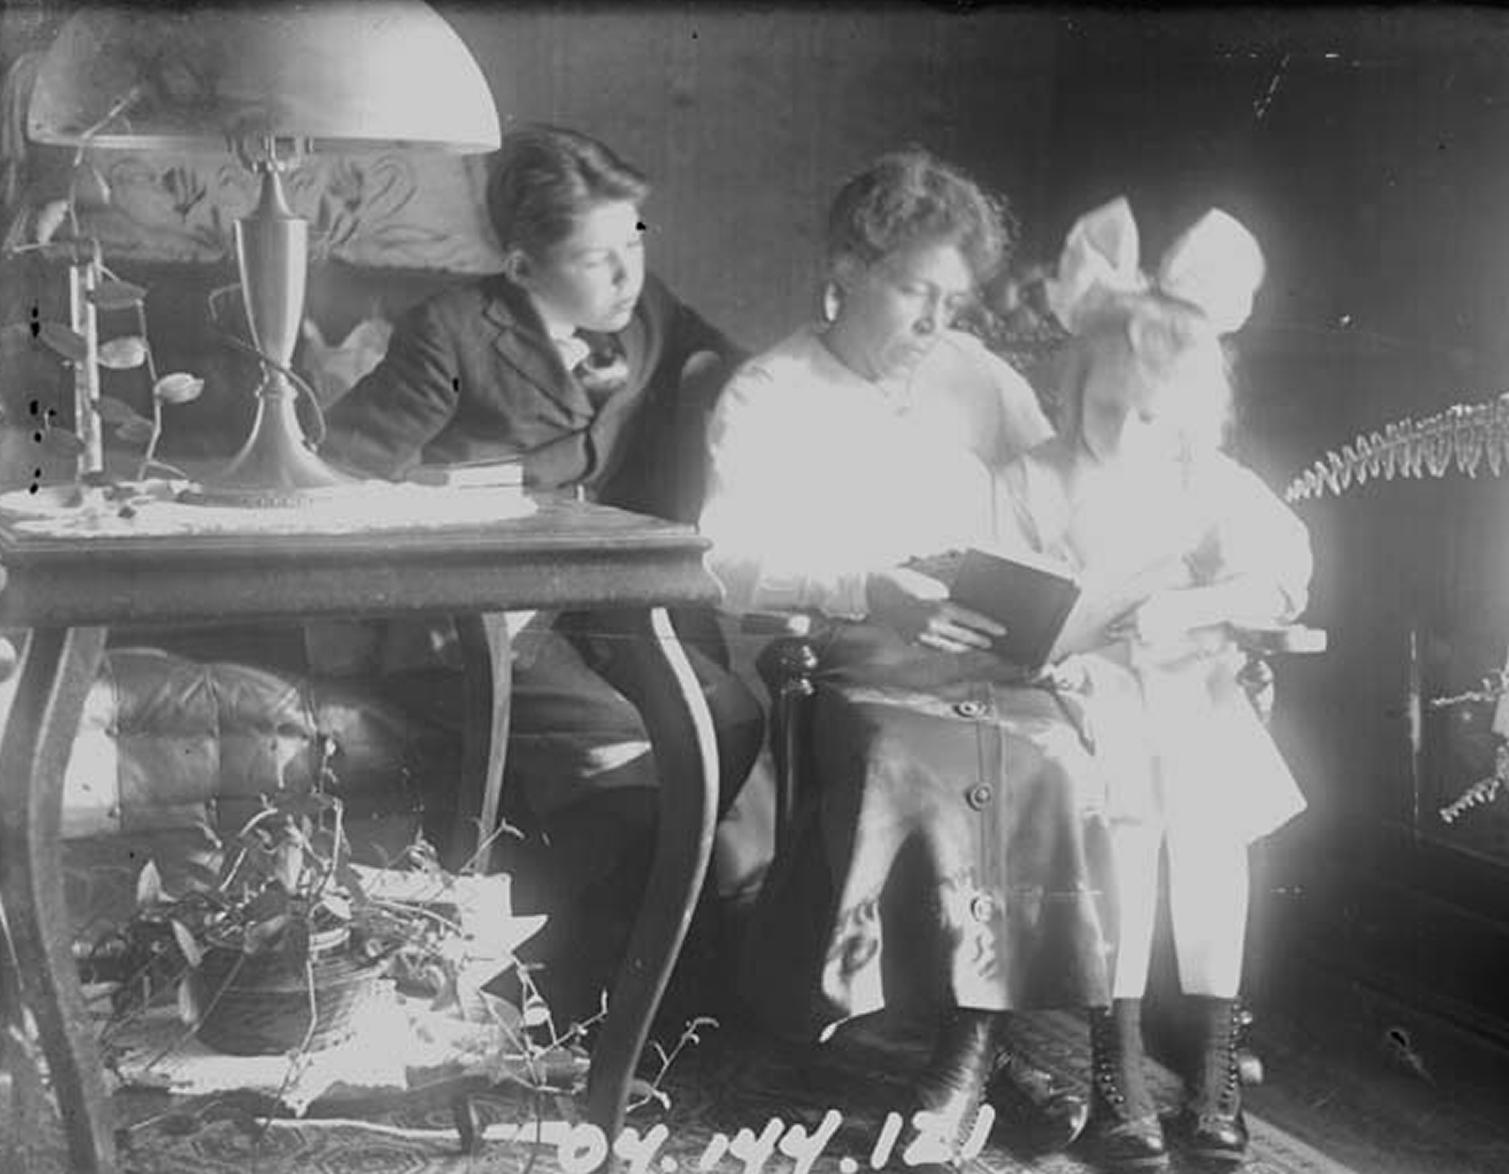 Satie Draper reading to her children Winnie and Merrell, c. 1920.  Satie's husband, Charles Draper, is the photographer.